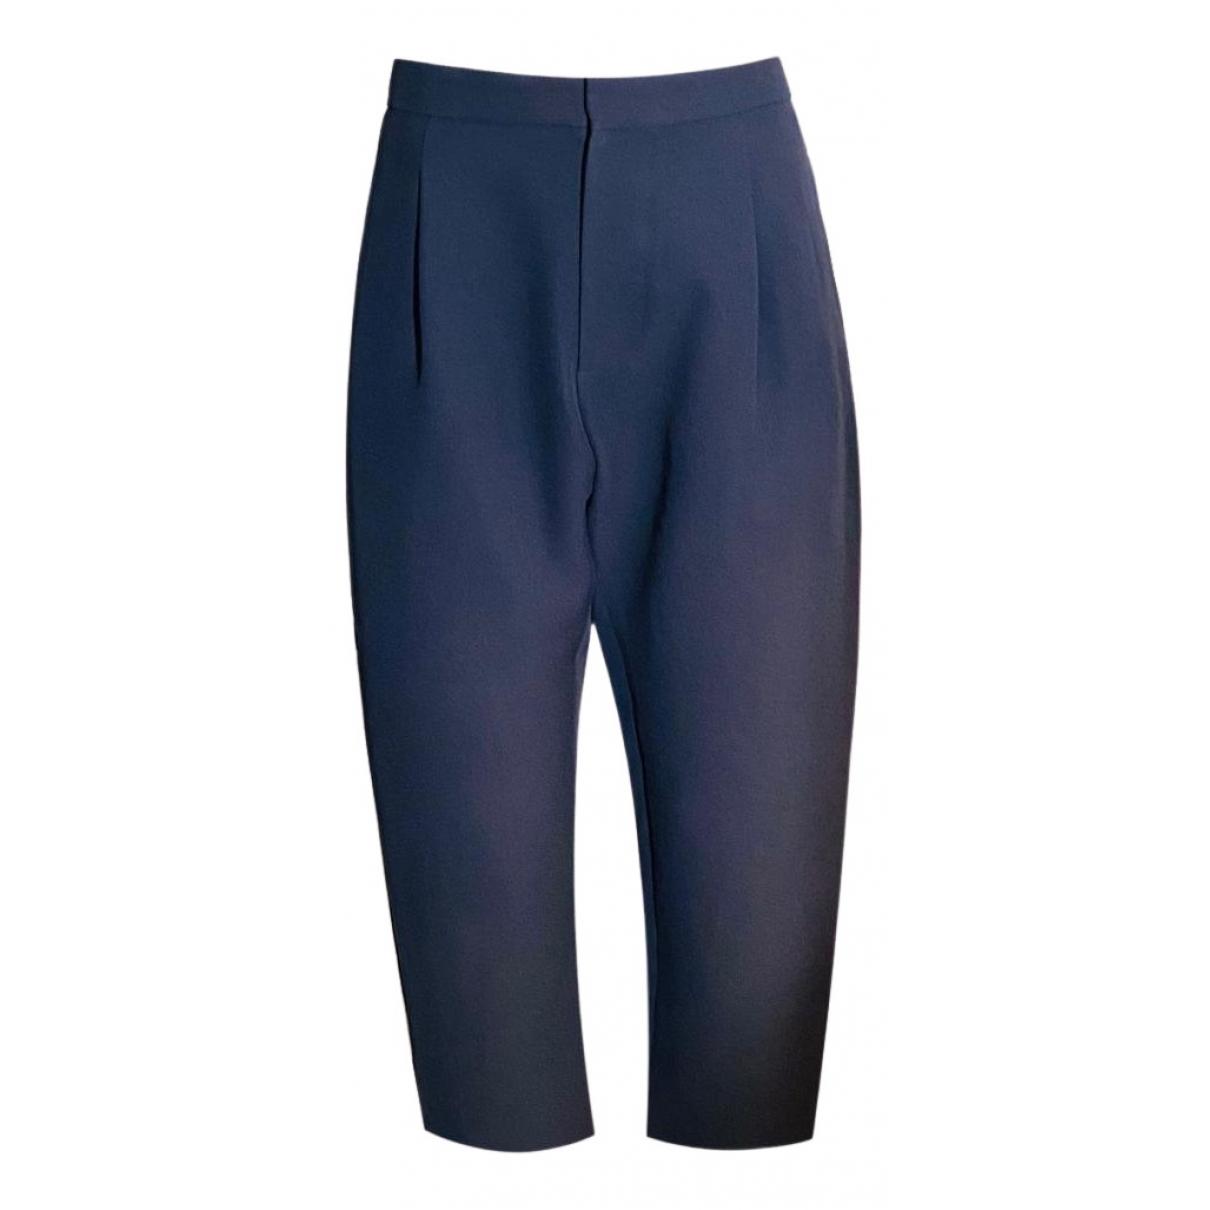 Marni N Navy Trousers for Women 38 IT